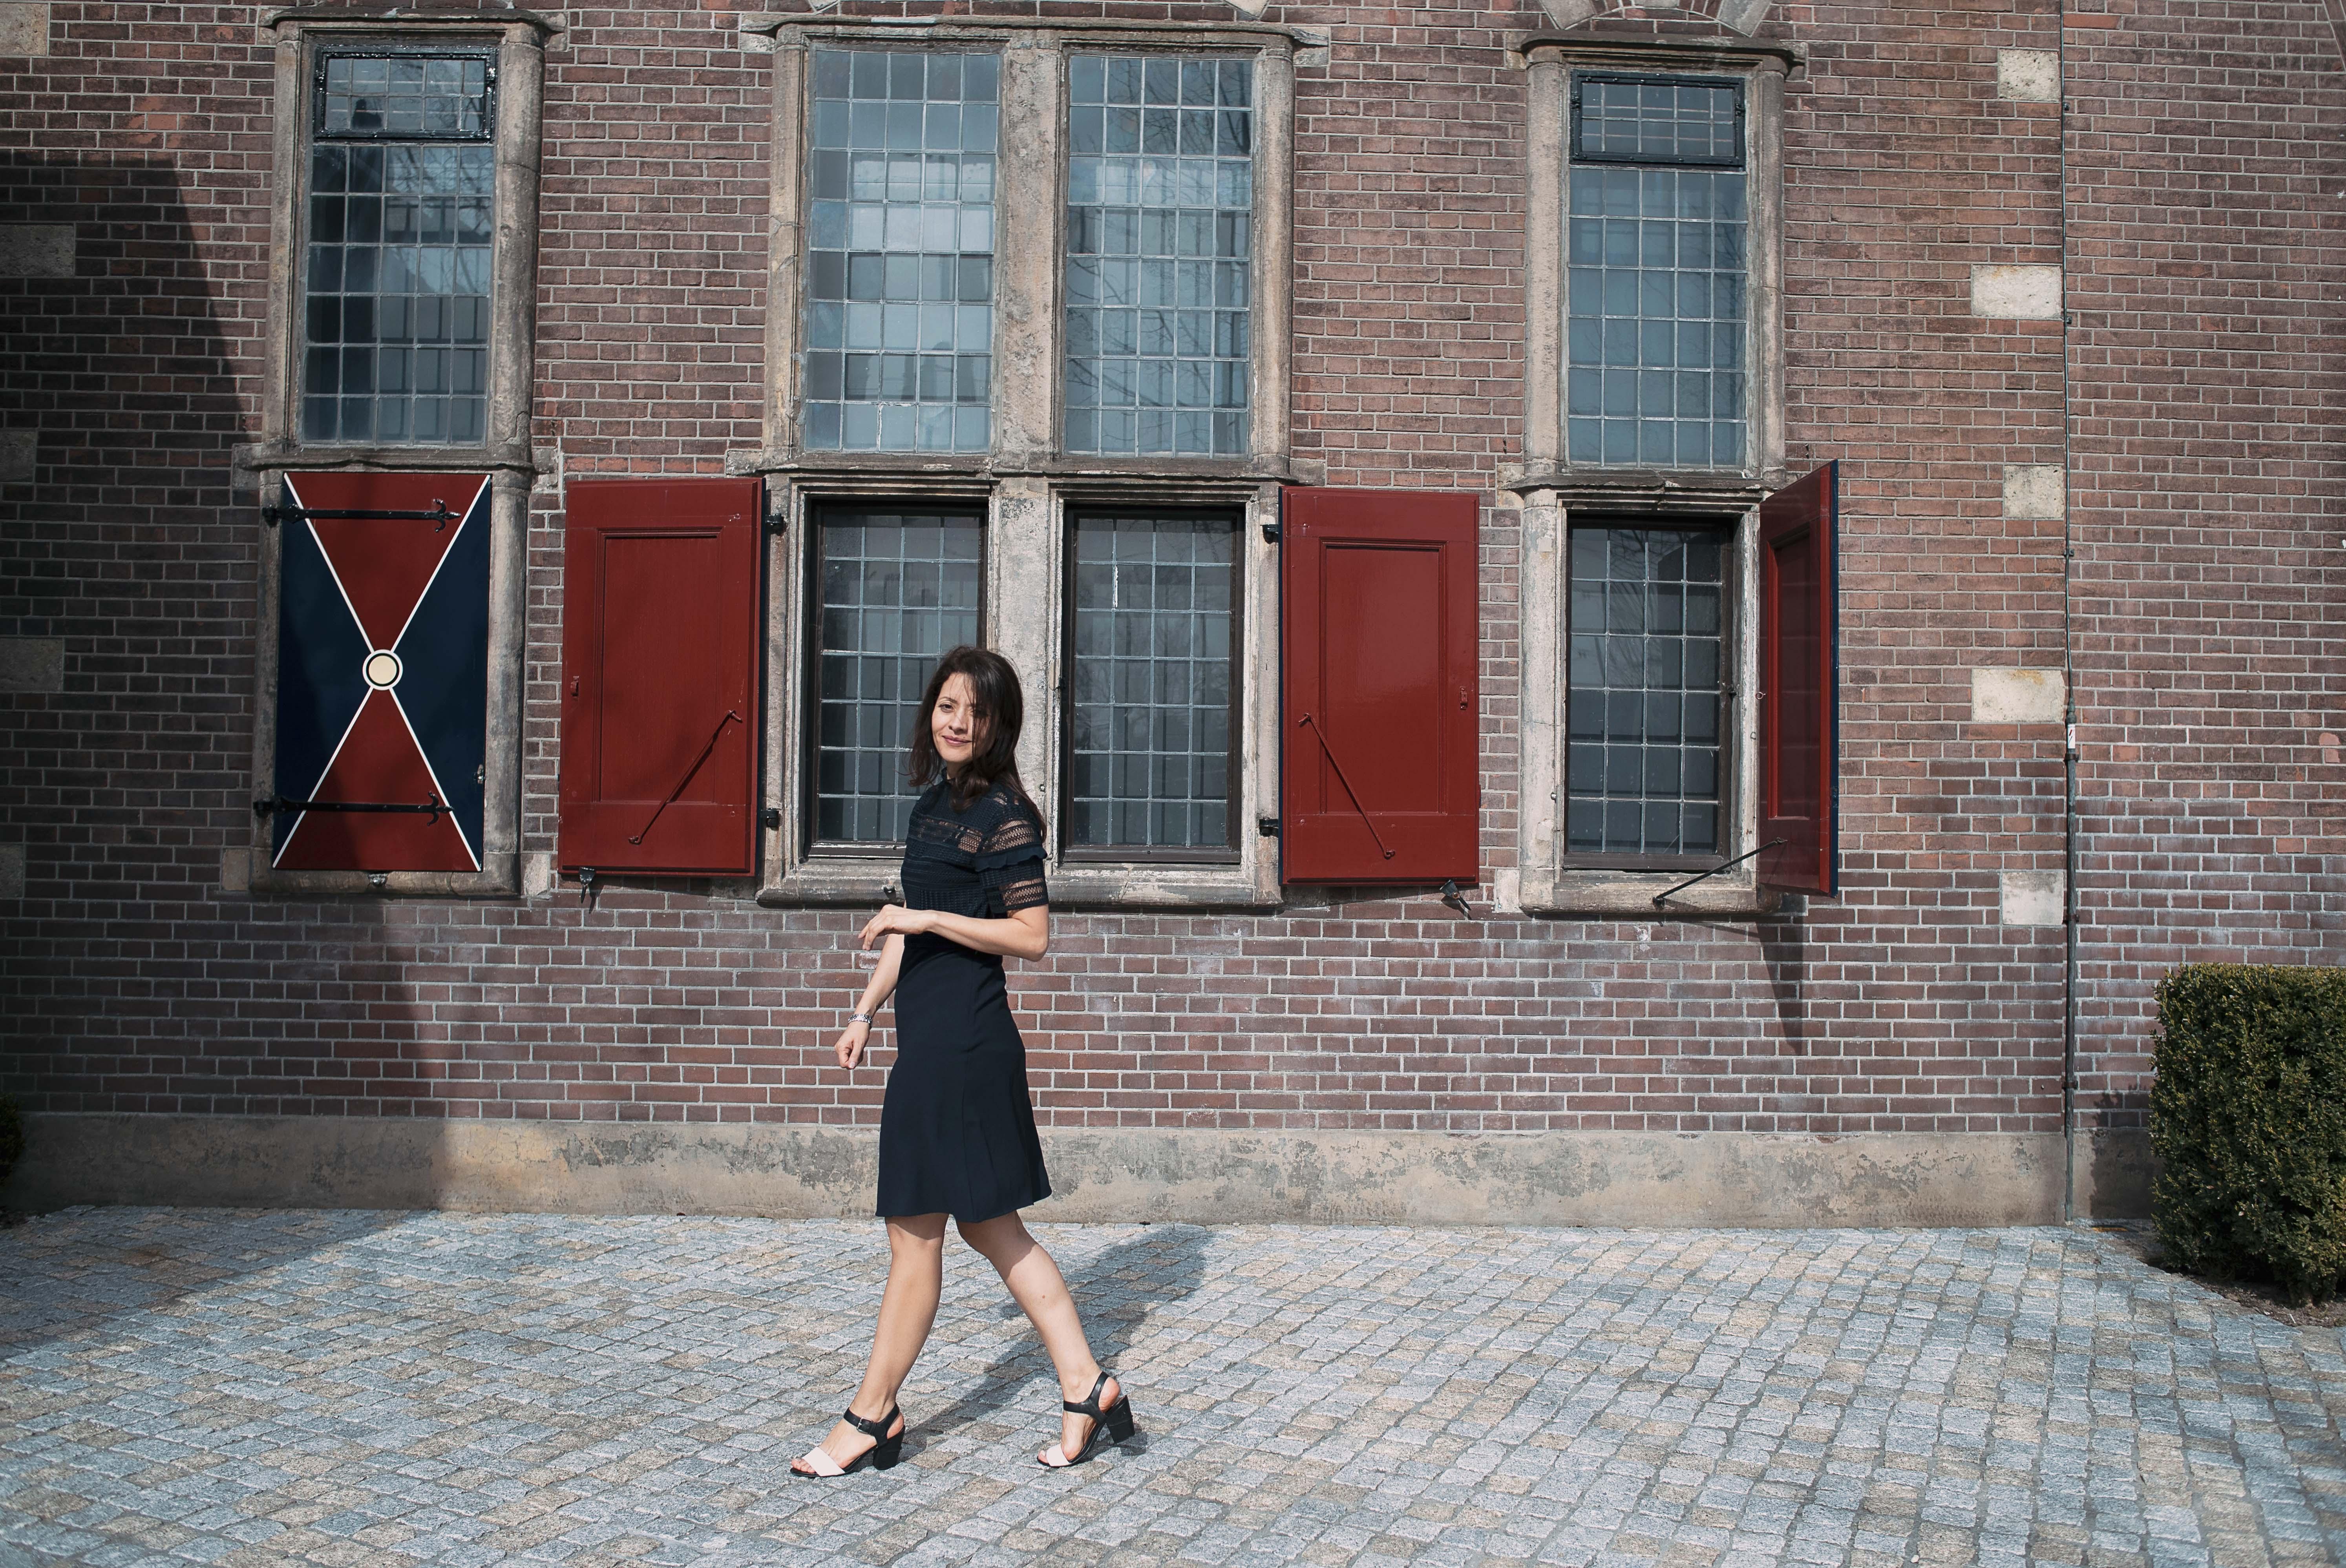 Personal Branding Coach and Photographer Luisa Machacon